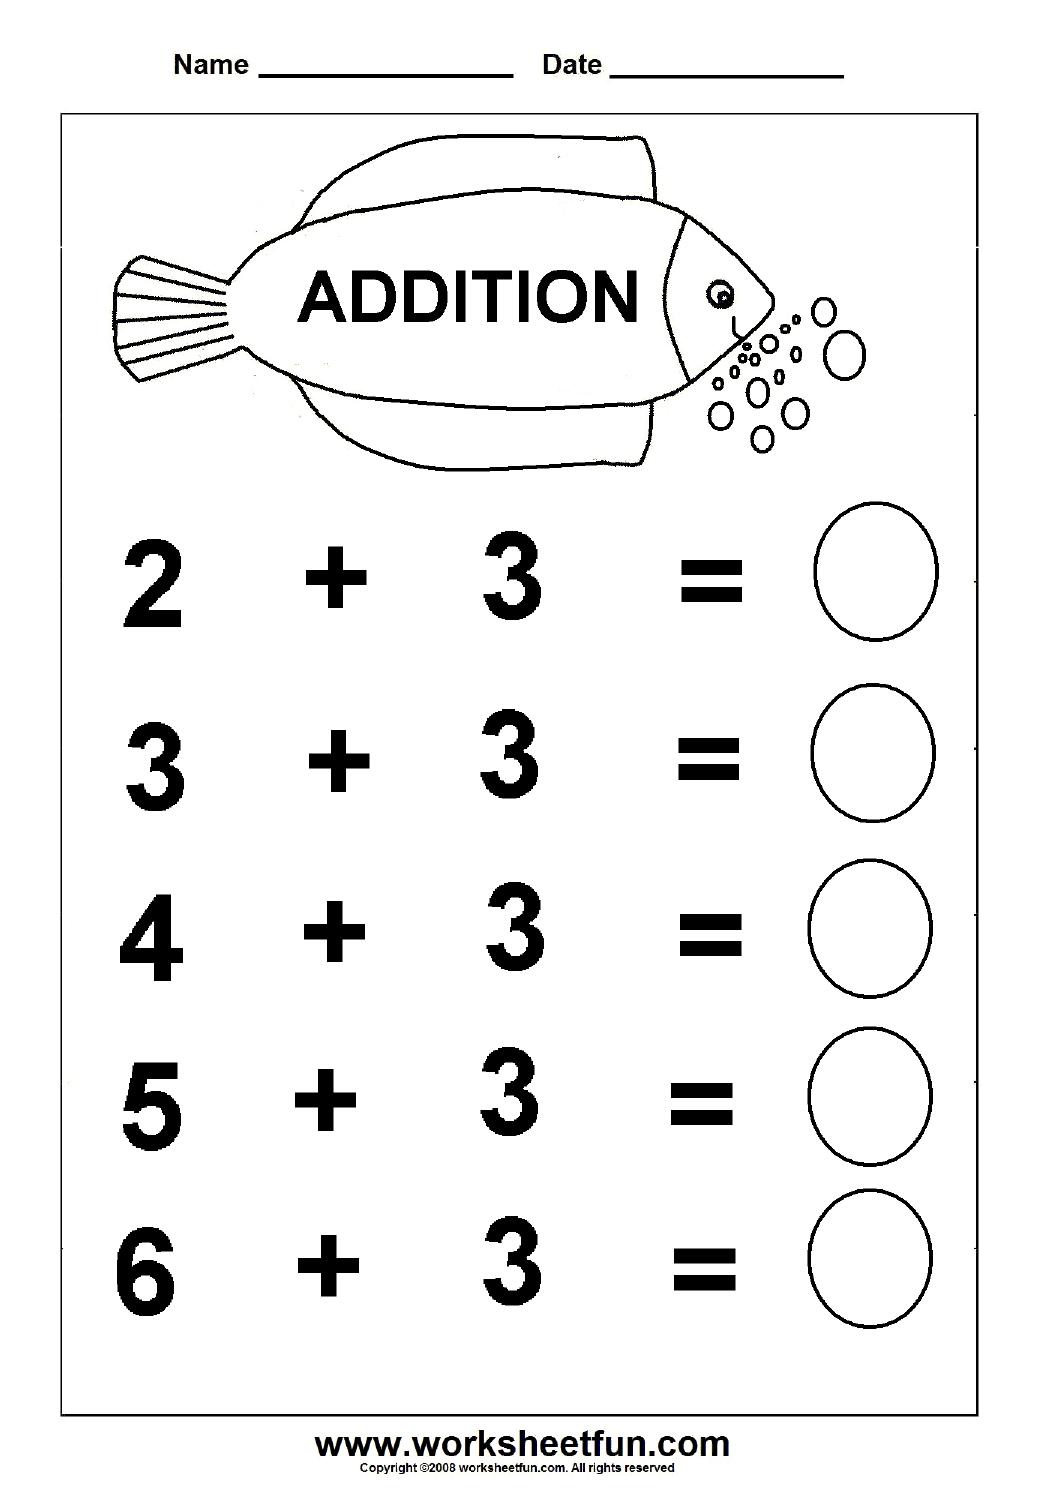 Free Printable Simple Math Worksheets